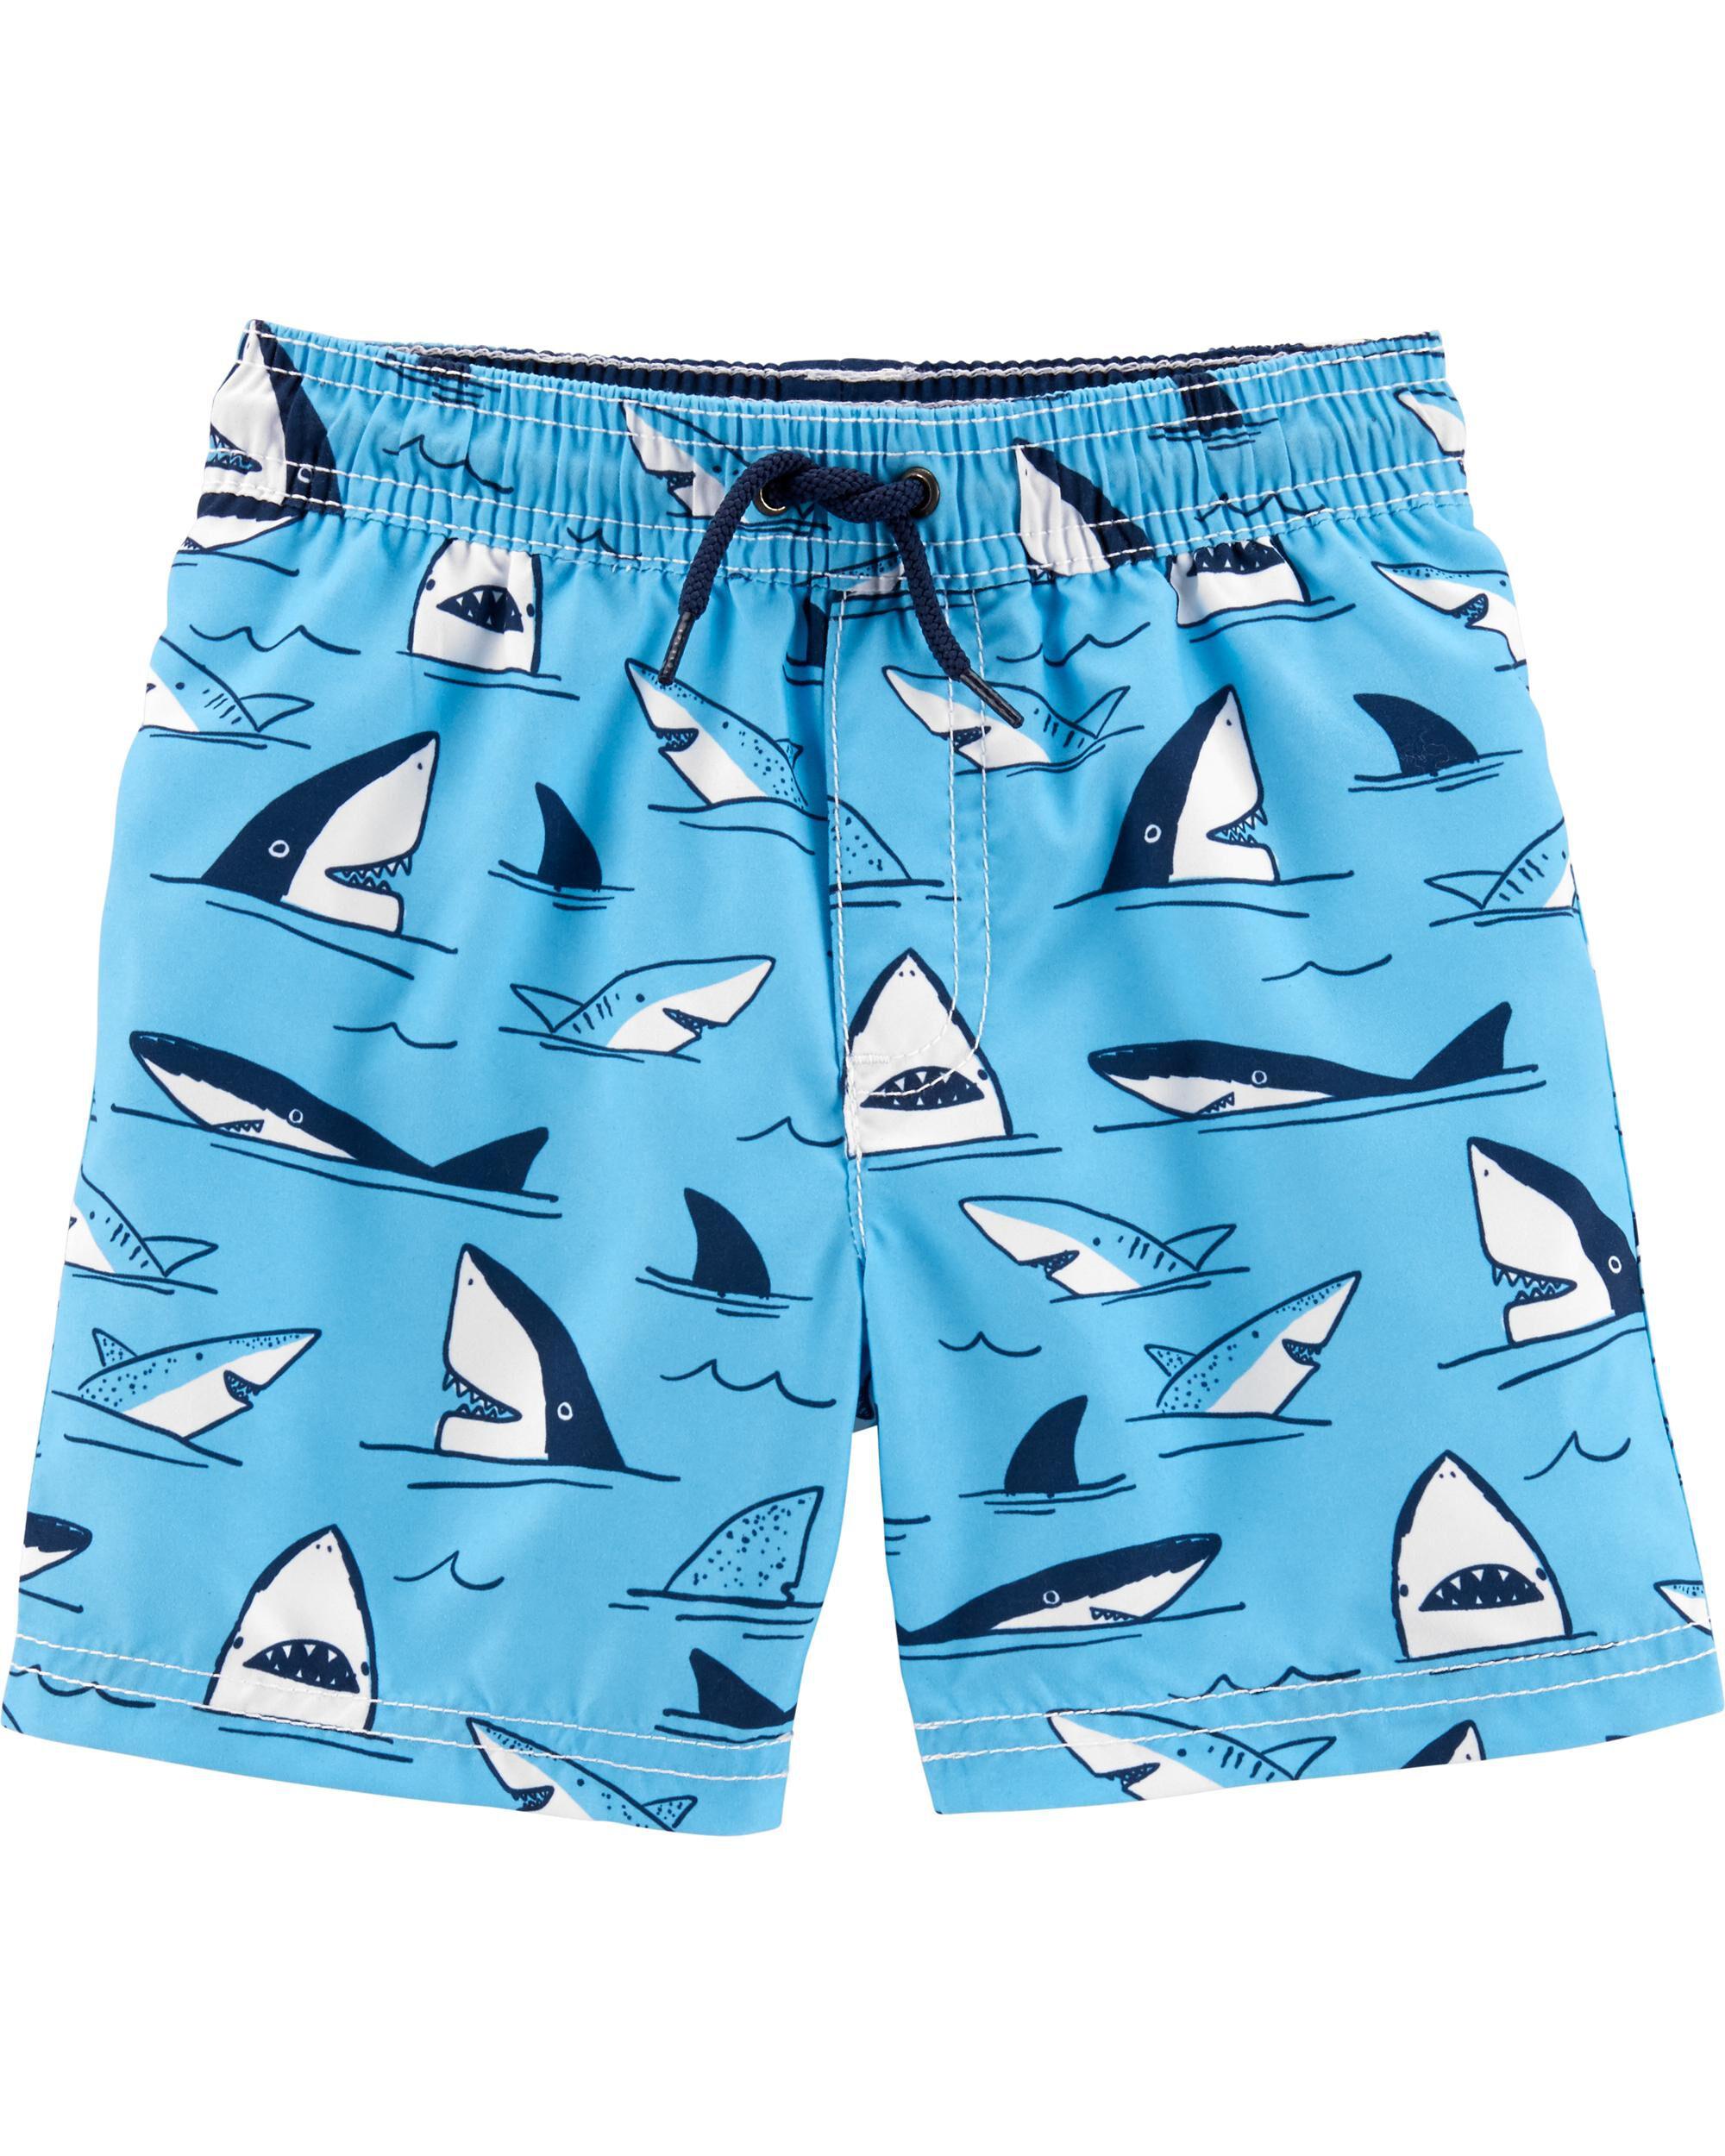 *Clearance*  Carter's Shark Swim Trunks